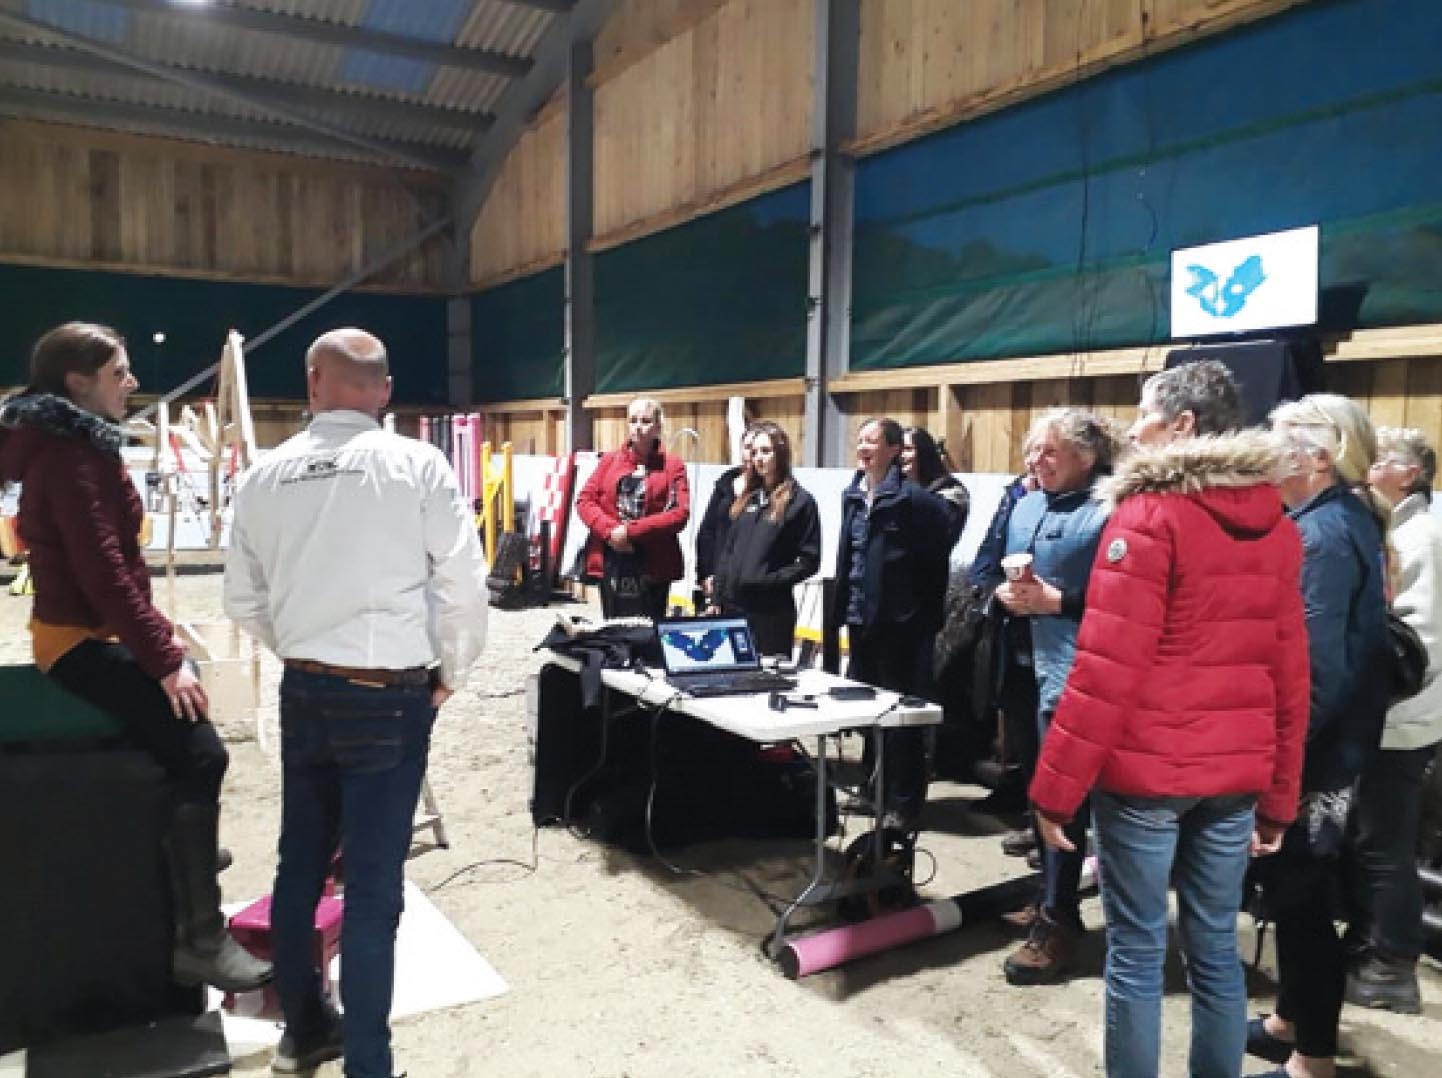 Pegasus on Nov 19 coverage of open evening for Faversham RC - 2019 3